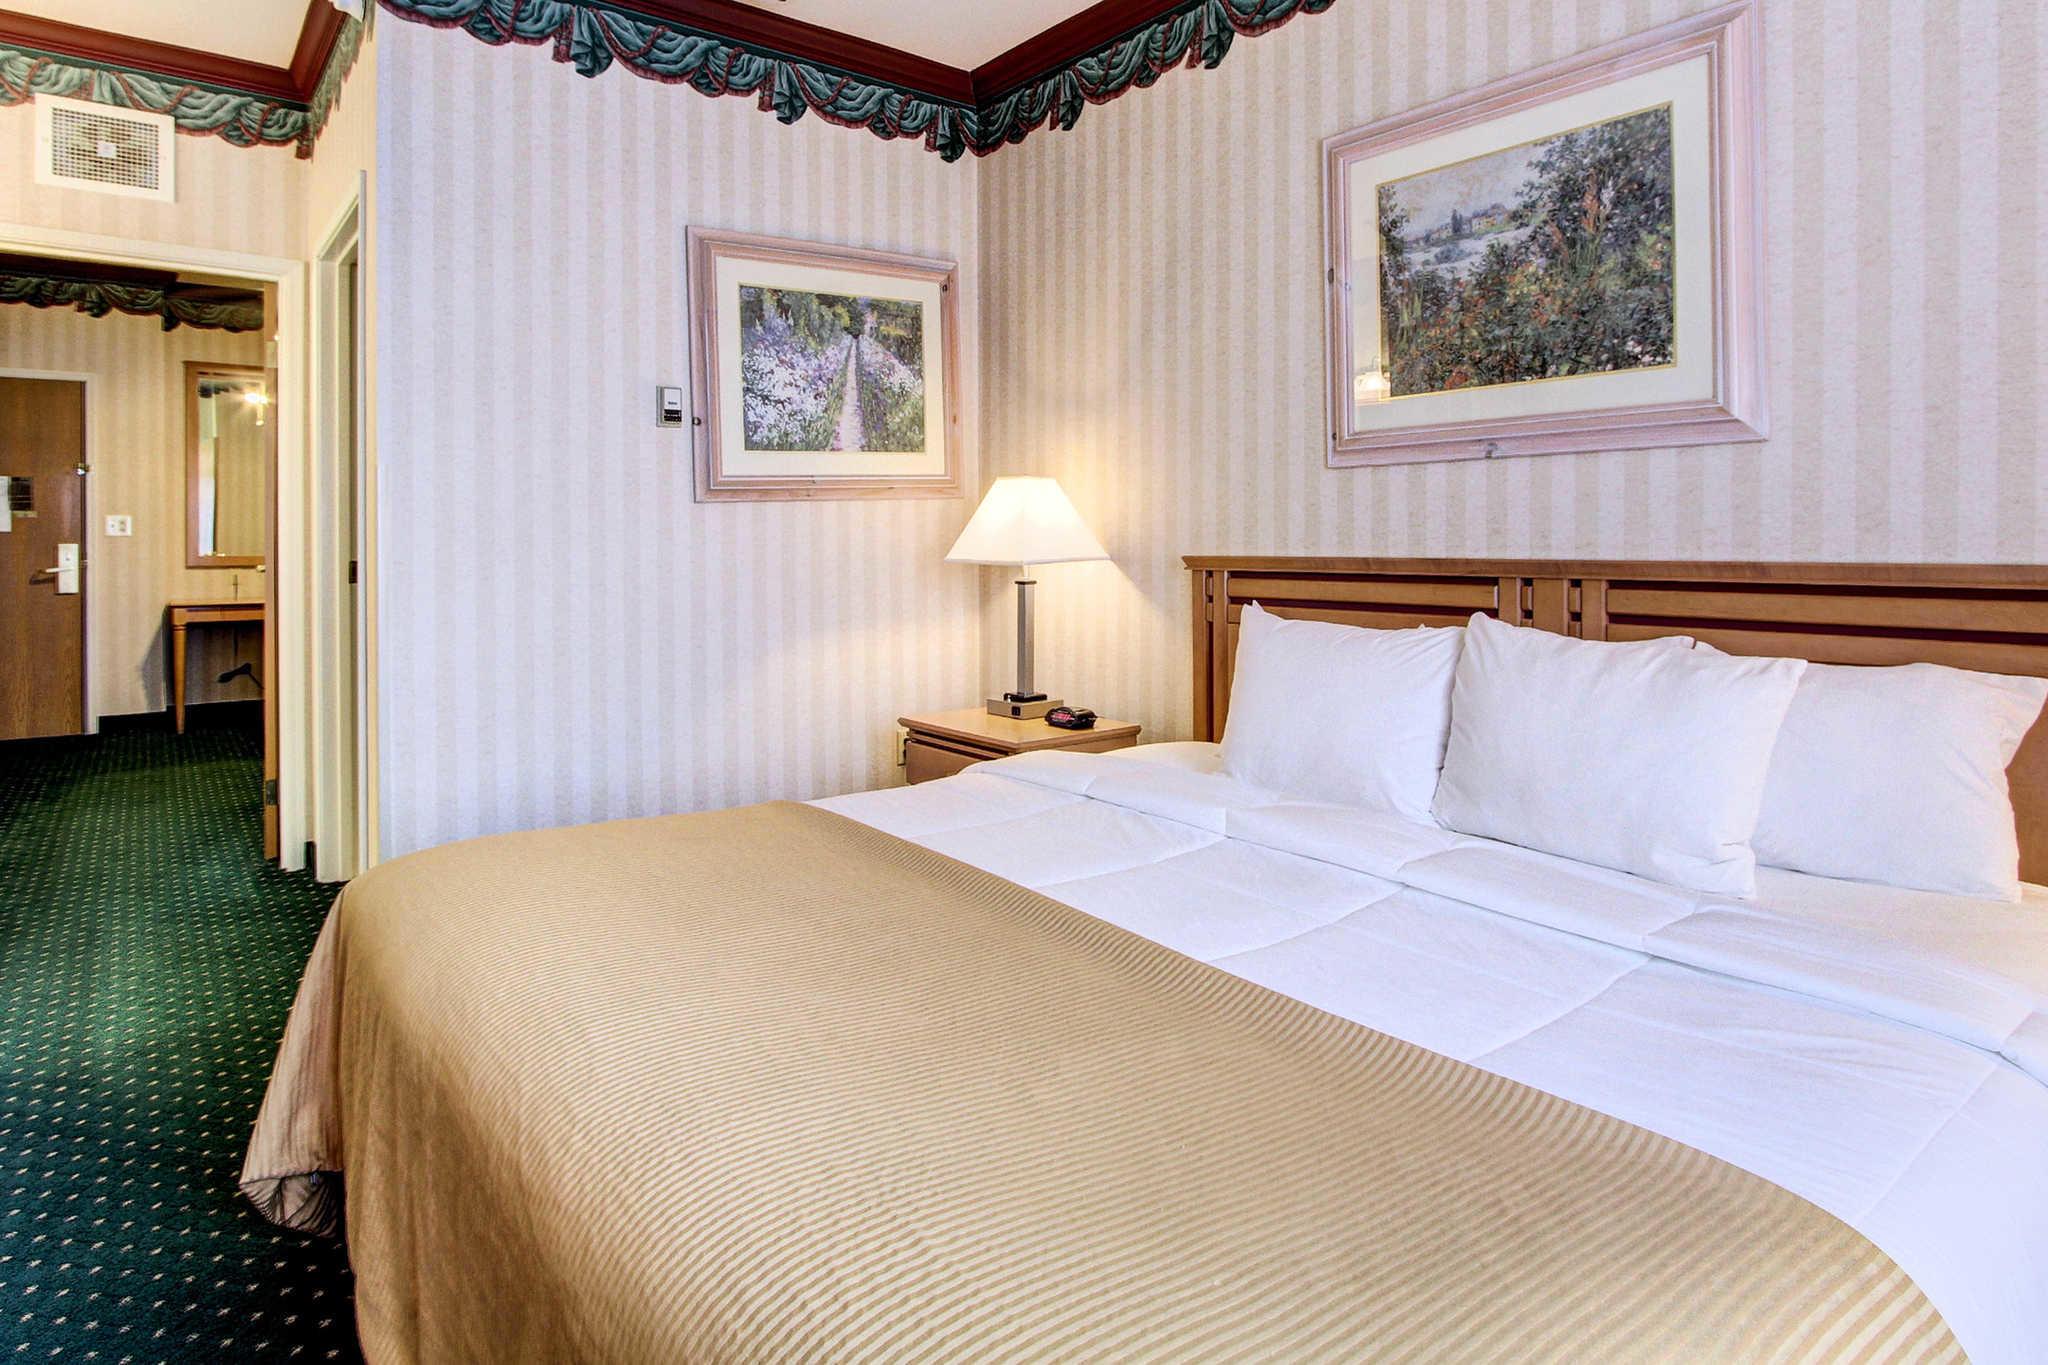 Clarion Suites Downtown image 5